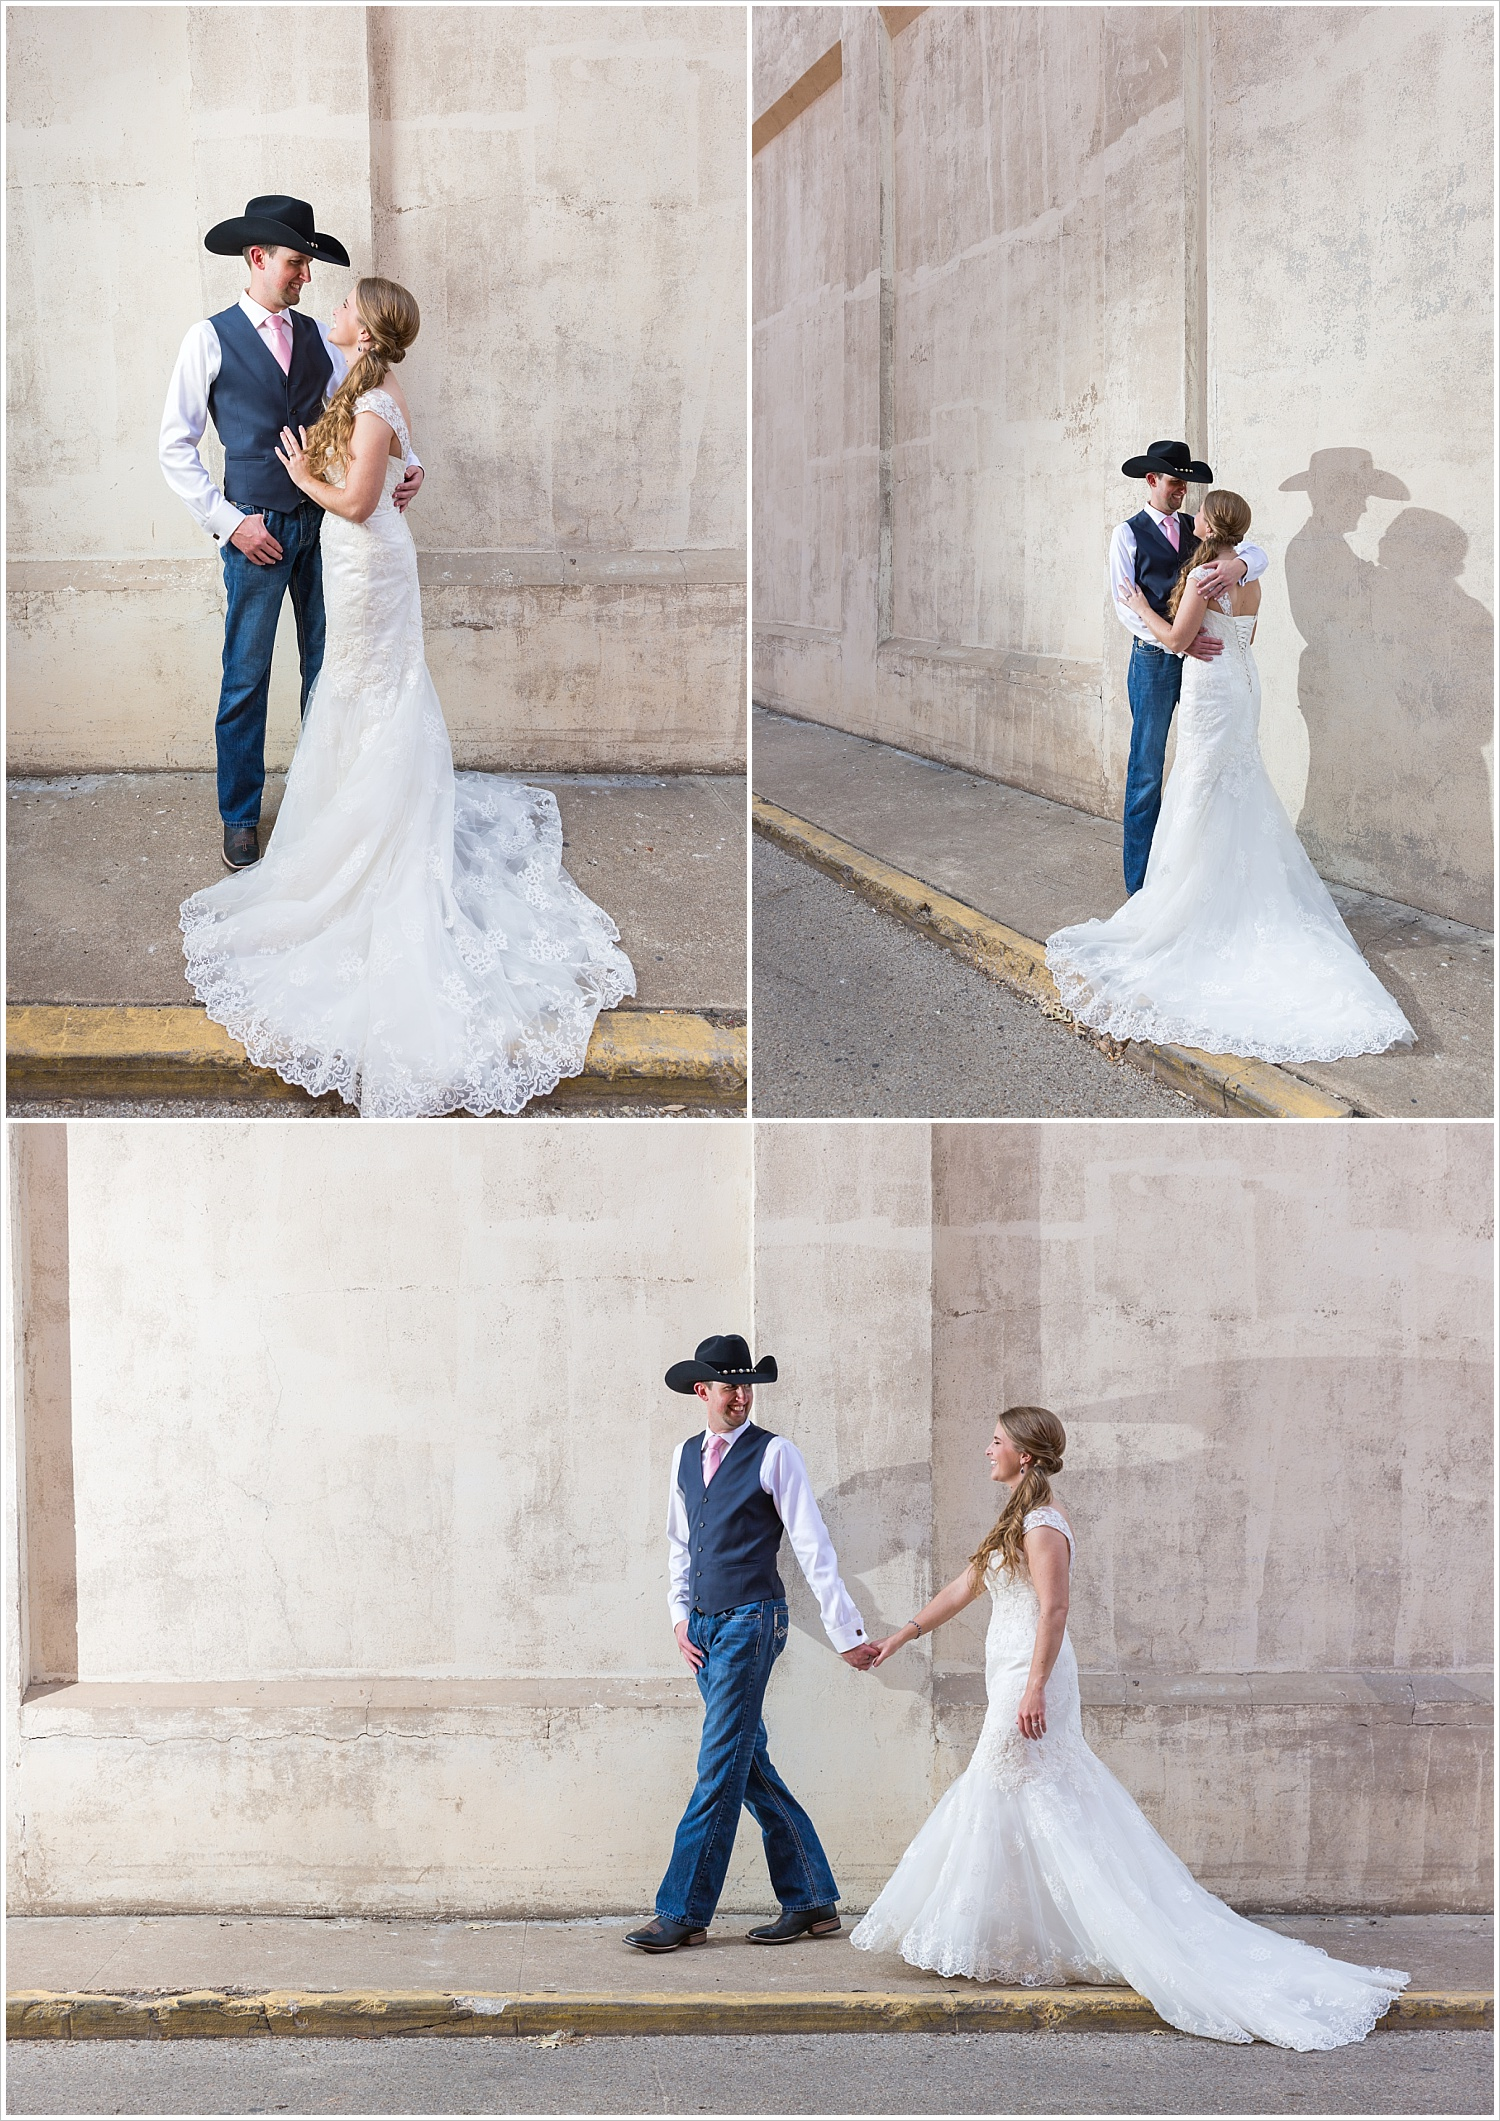 Bride and groom in downtown Waco, Navy and blush Texas Reception at The Phoenix Ballroom, Jason & Melaina Photography - www.jasonandmelaina.com